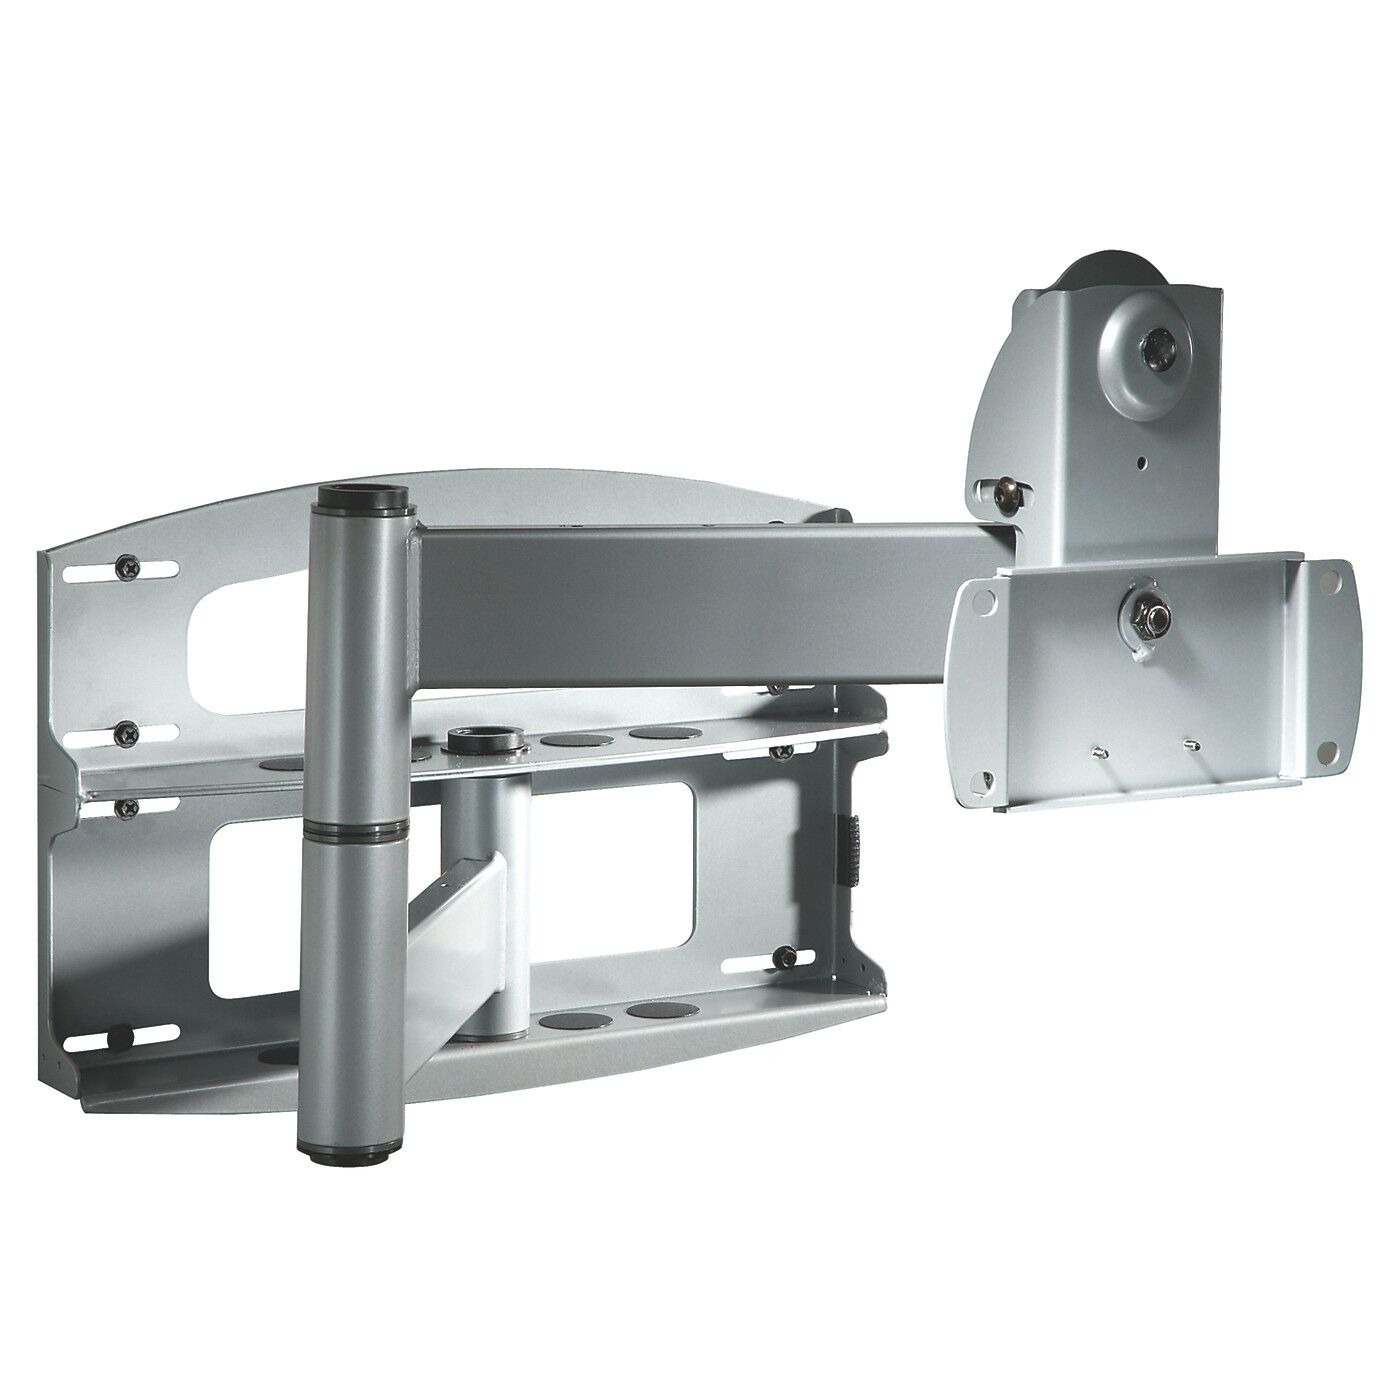 Flat Panel Articulating Arm/Tilt Wall Mount for 37